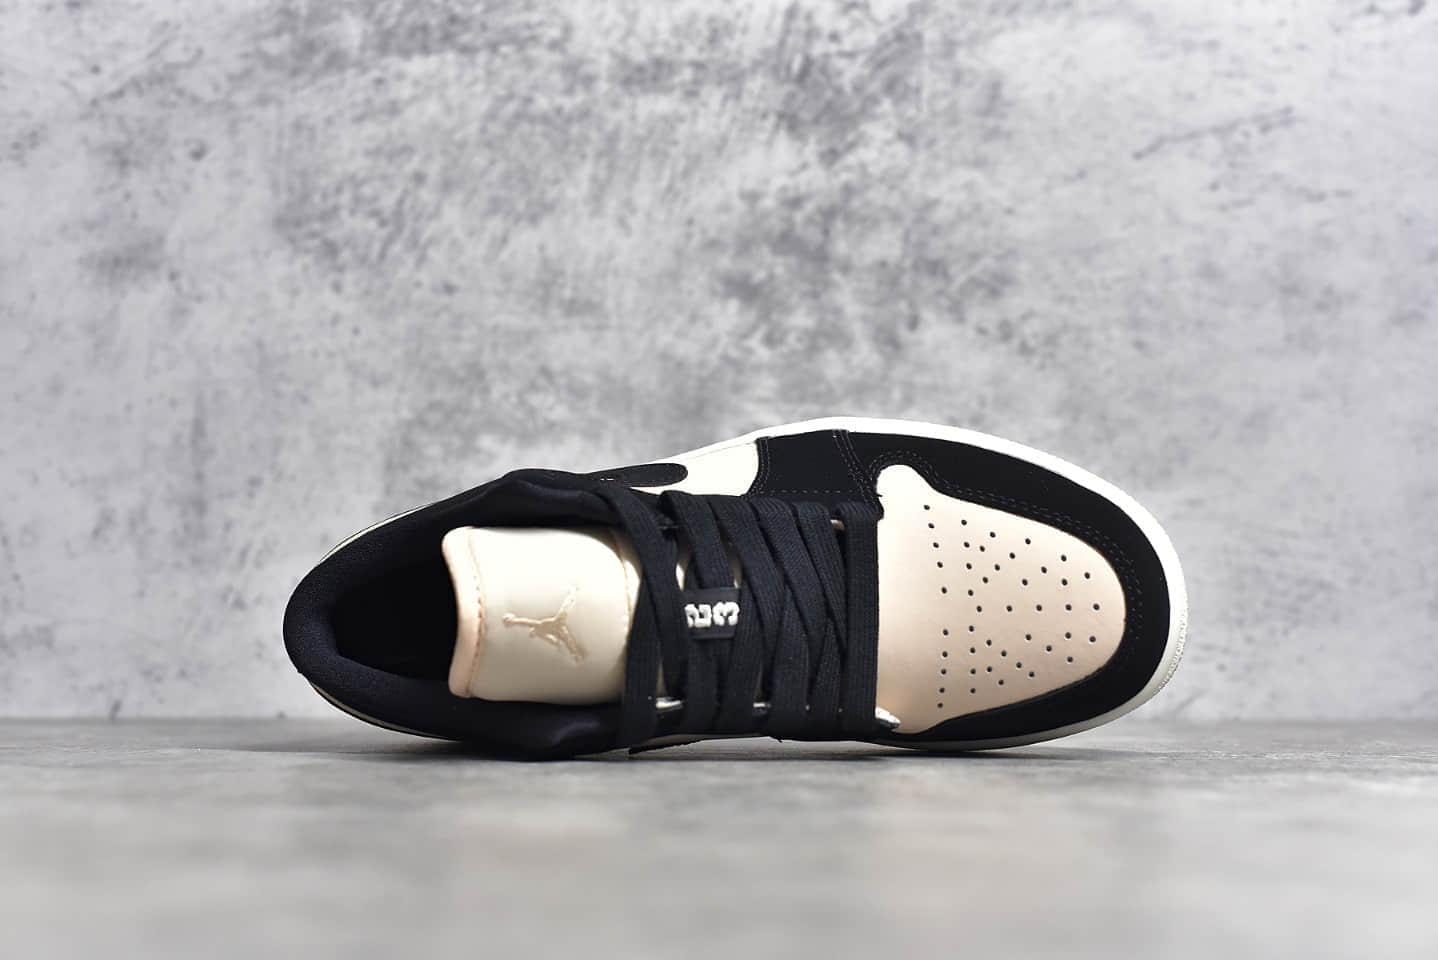 AJ1黑粉低帮 AJGS版本 Air Jordan 1 低帮 莆田顶级YH纯原版本 货号:DC0774-003-潮流者之家